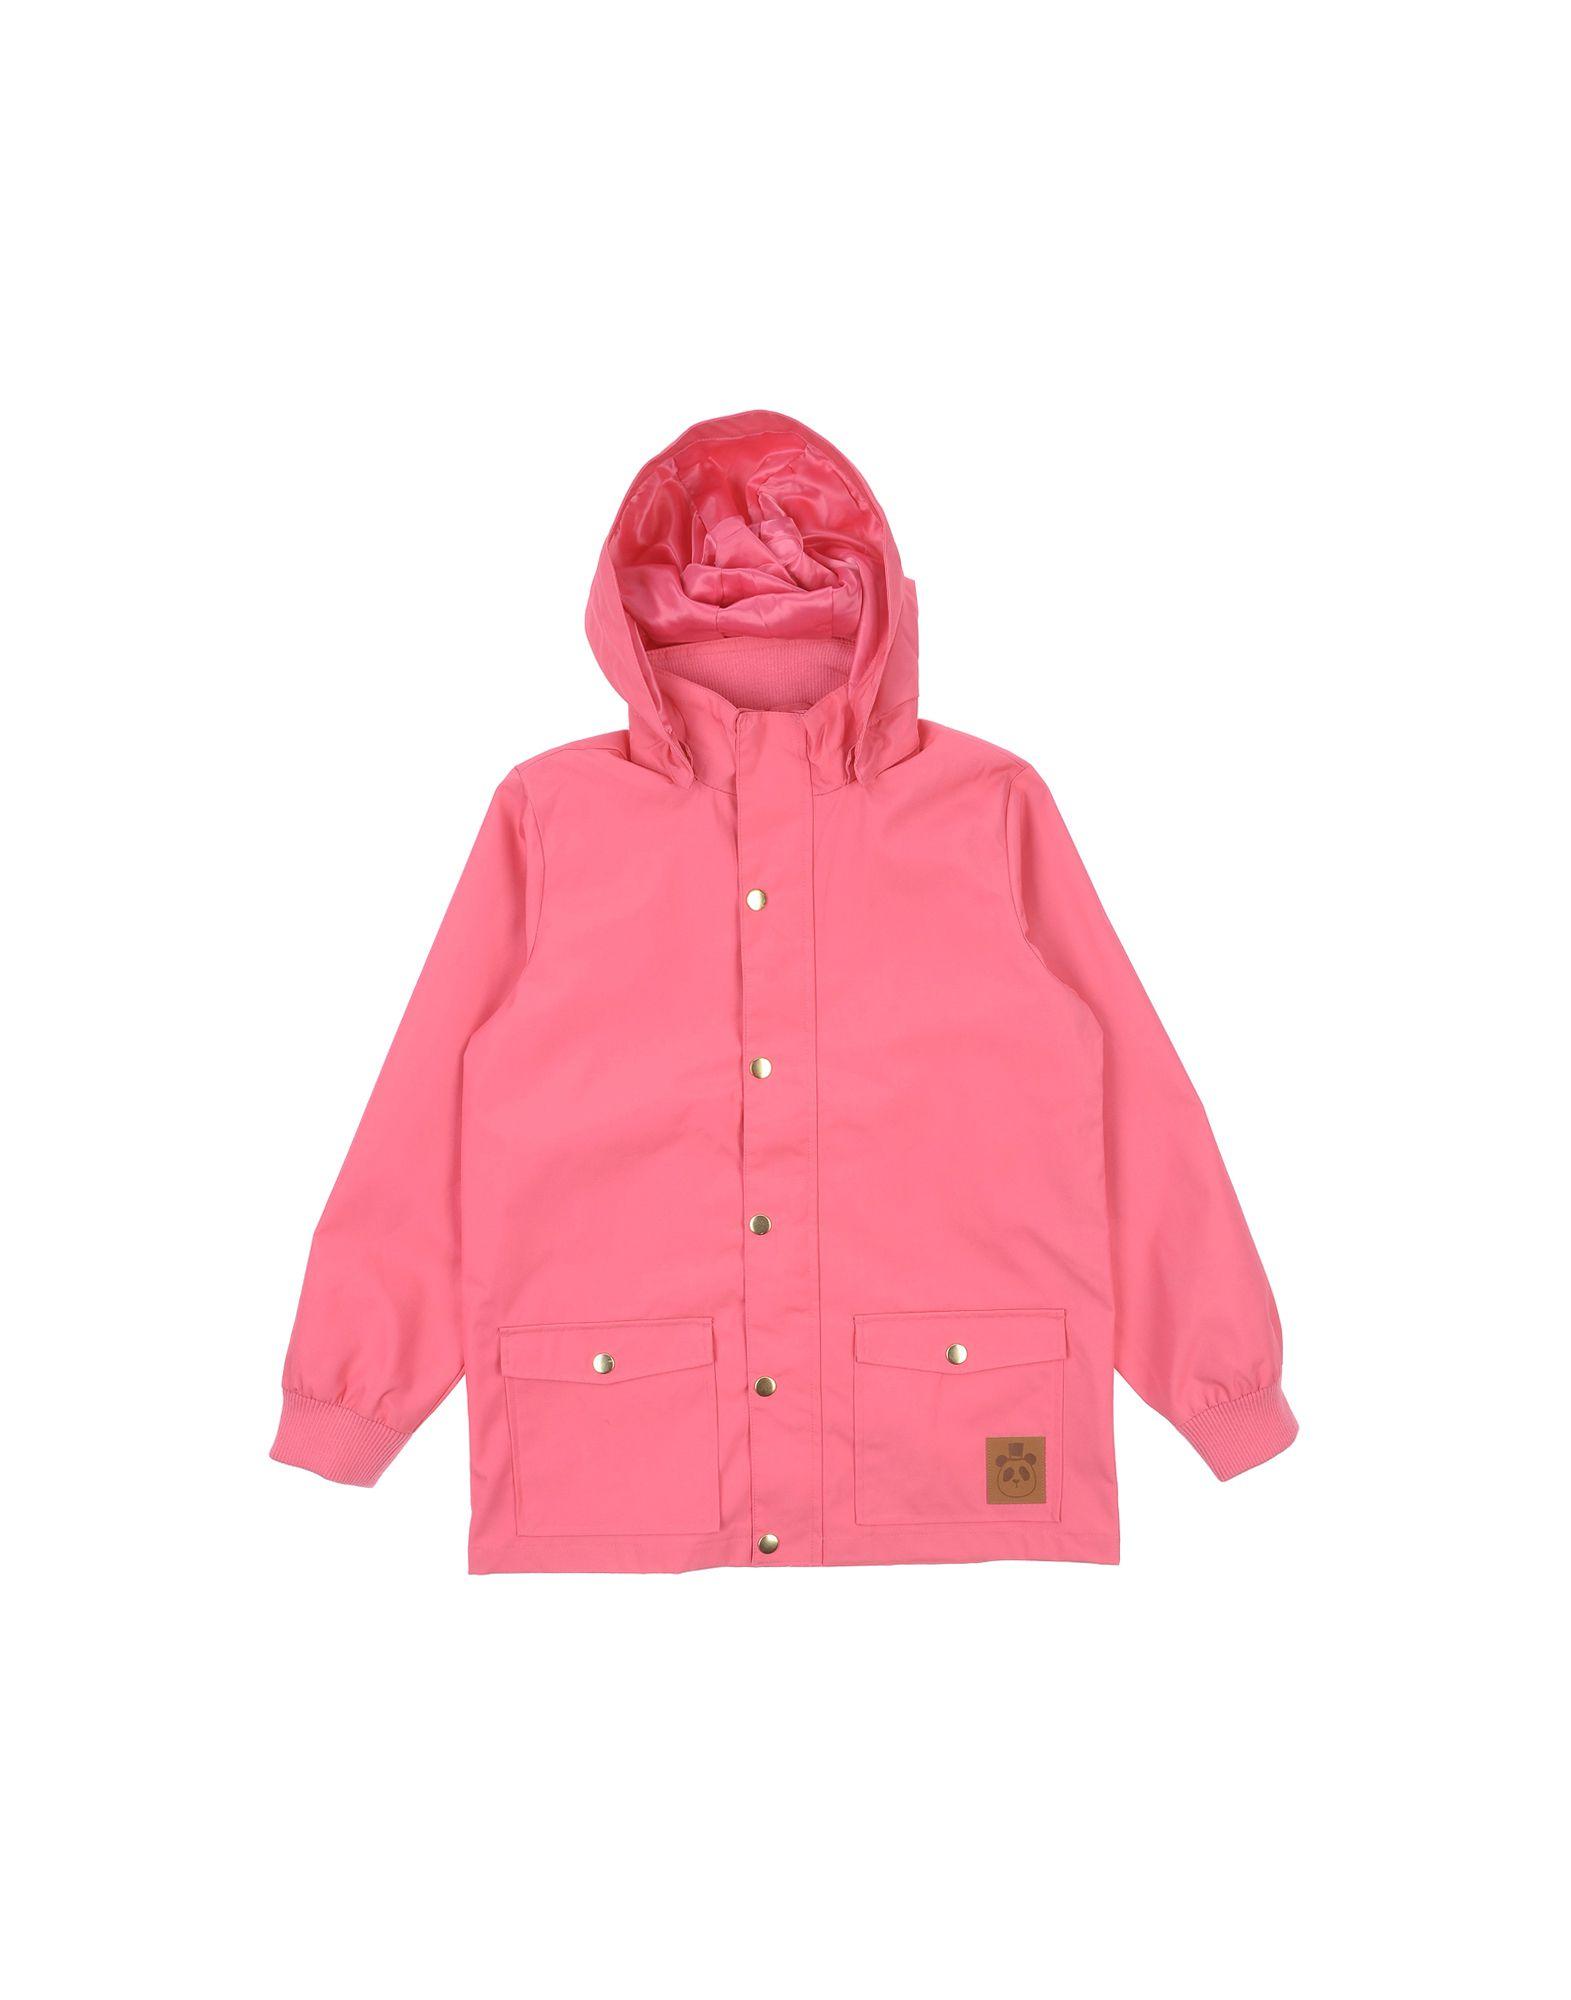 MINI RODINI Full-length jackets